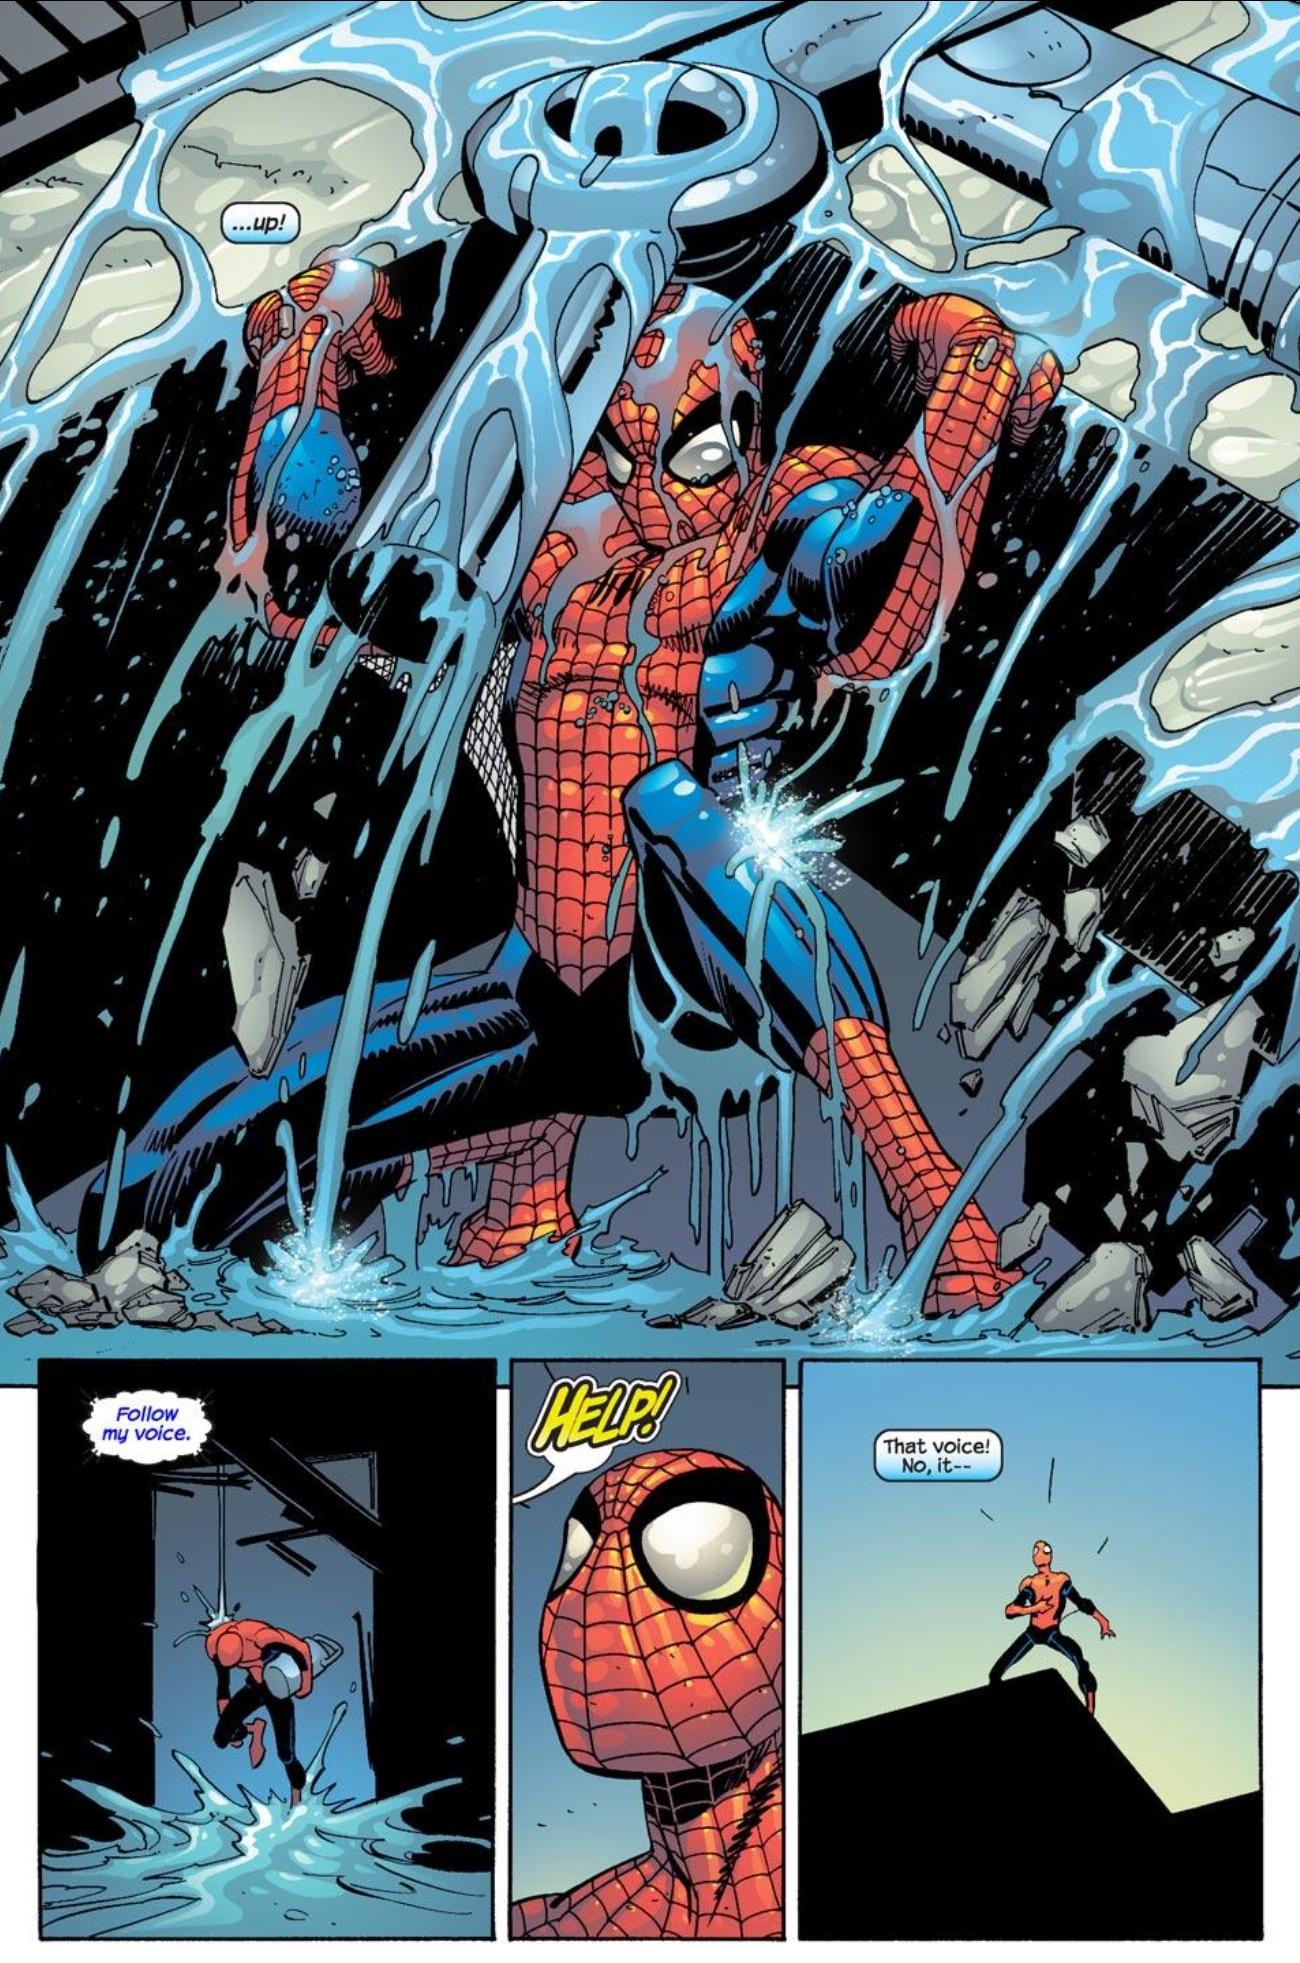 Superbohaterowie Marvela 1 Spider-Man 4 Gitarą Rysowane